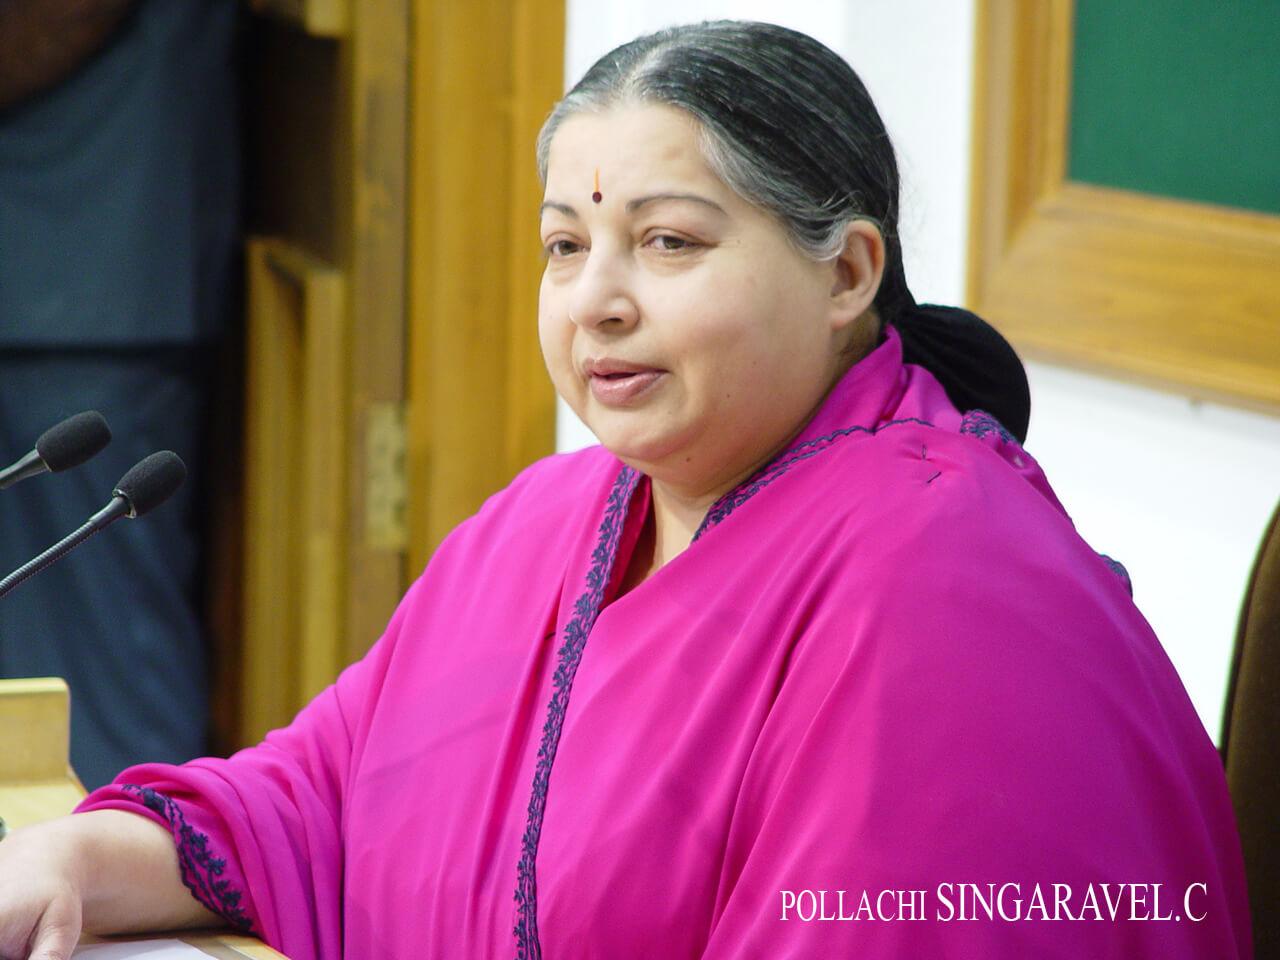 Download emSigner for GST, Download i Puratchi thalaivi amma photos